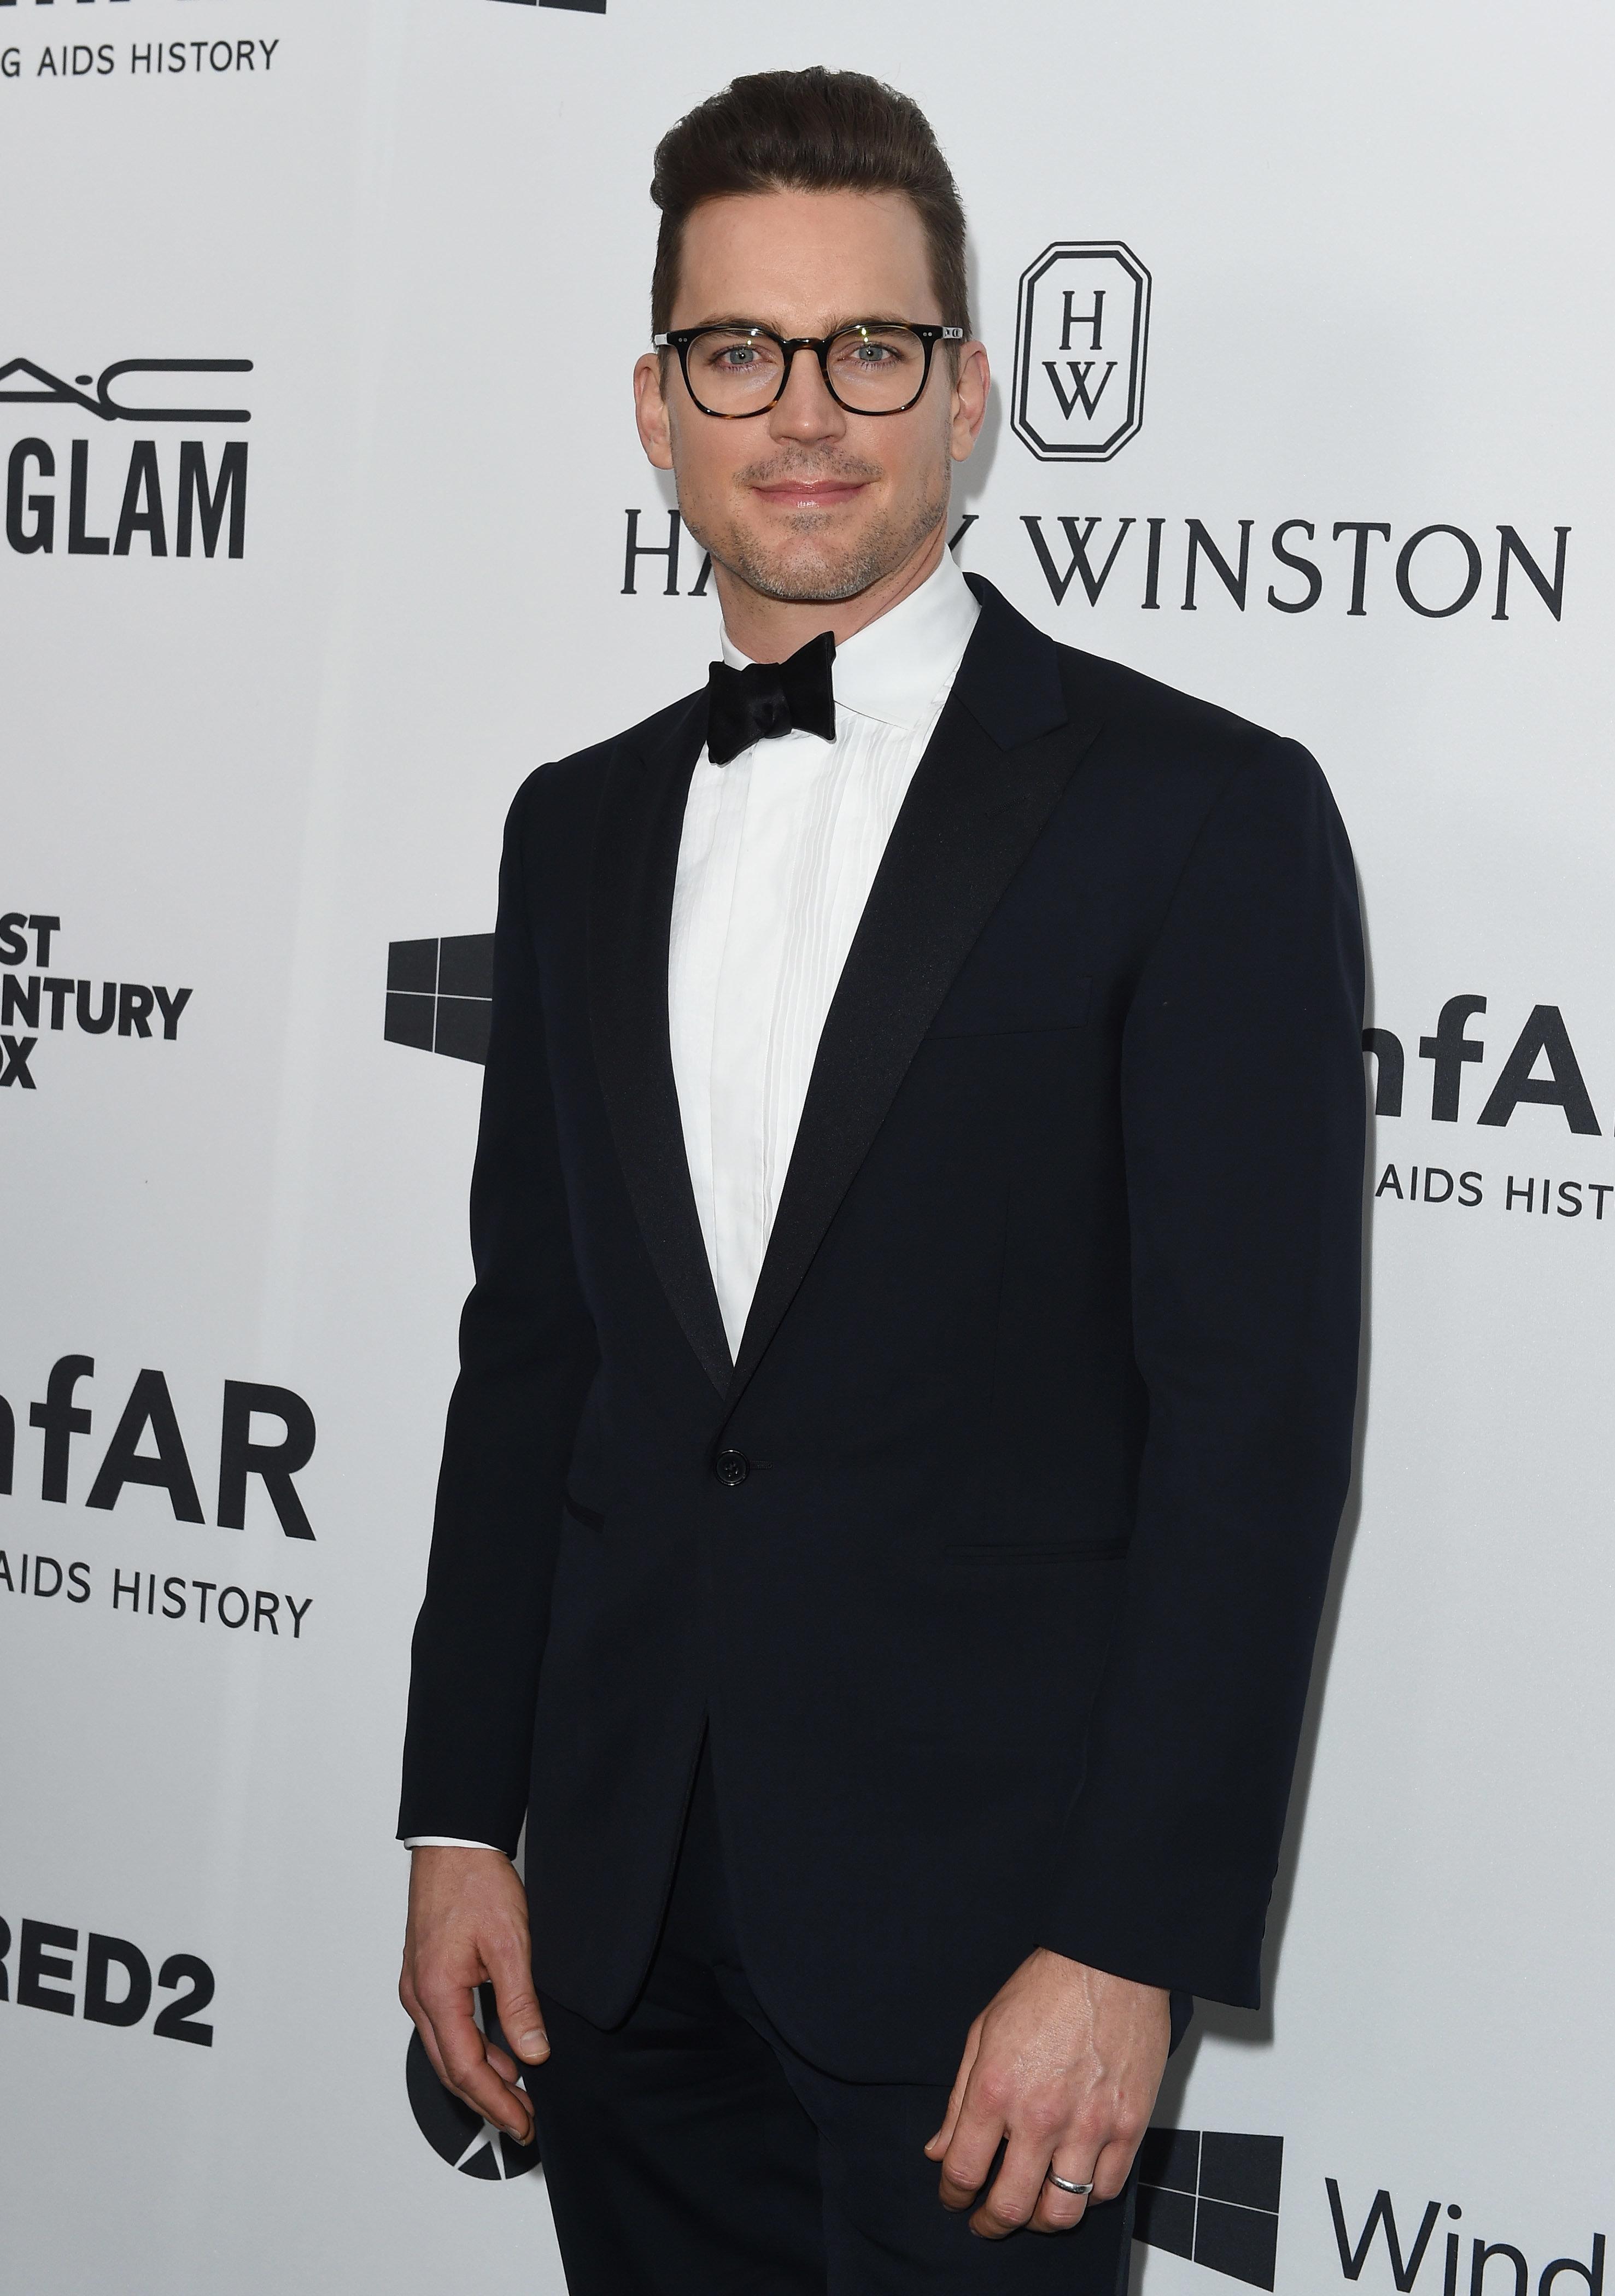 HOLLYWOOD, CA - OCTOBER 29:  Actor Matt Bomer arrives at amfAR's Inspiration Gala Los Angeles at Milk Studios on October 29, 2015 in Hollywood, California.  (Photo by Axelle/Bauer-Griffin/FilmMagic)